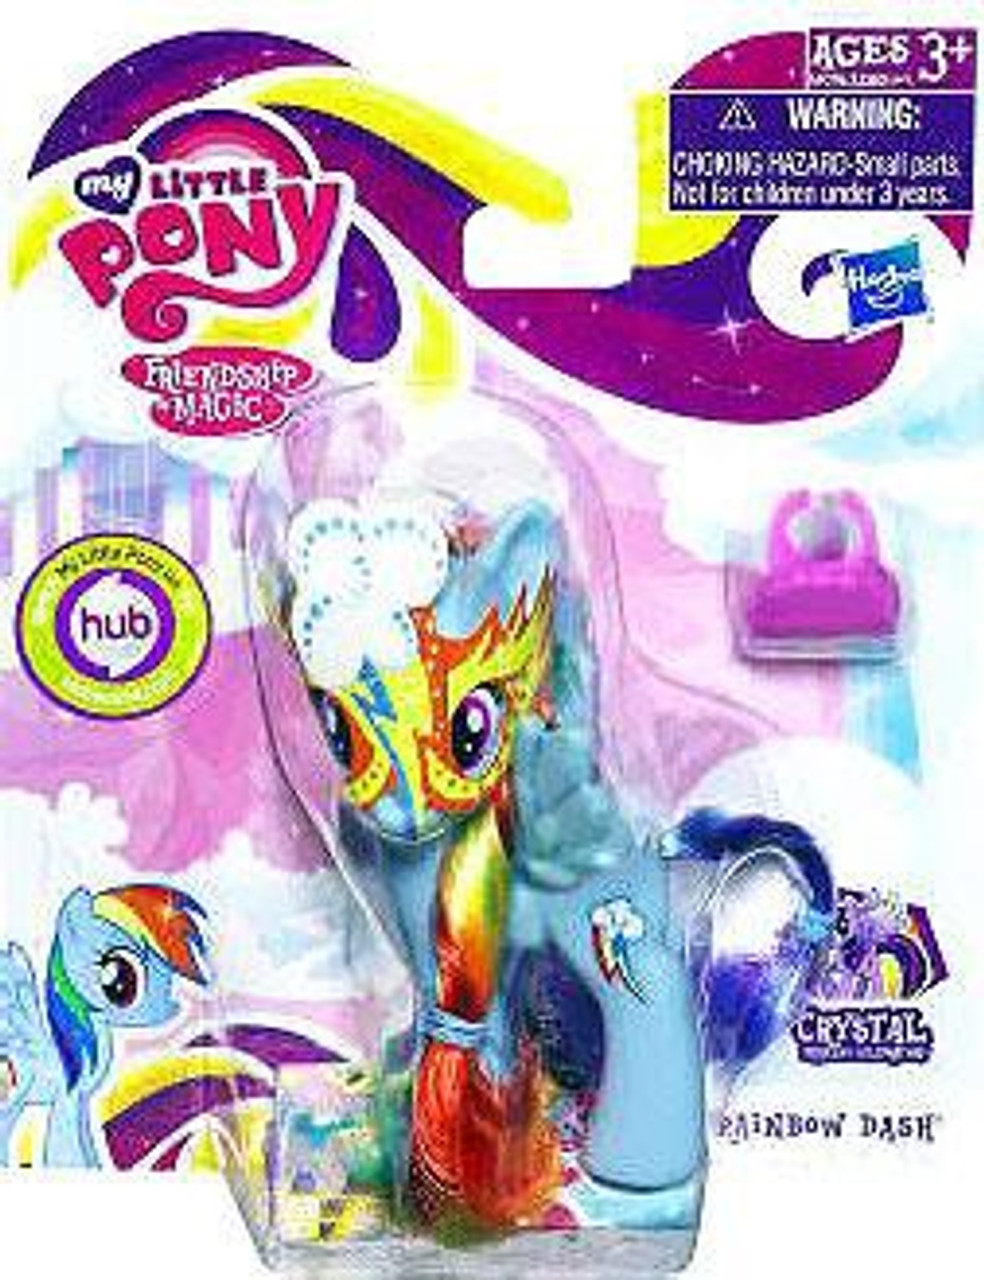 My Little Pony Friendship is Magic Crystal Empire Masquerade Rainbow Dash Figure